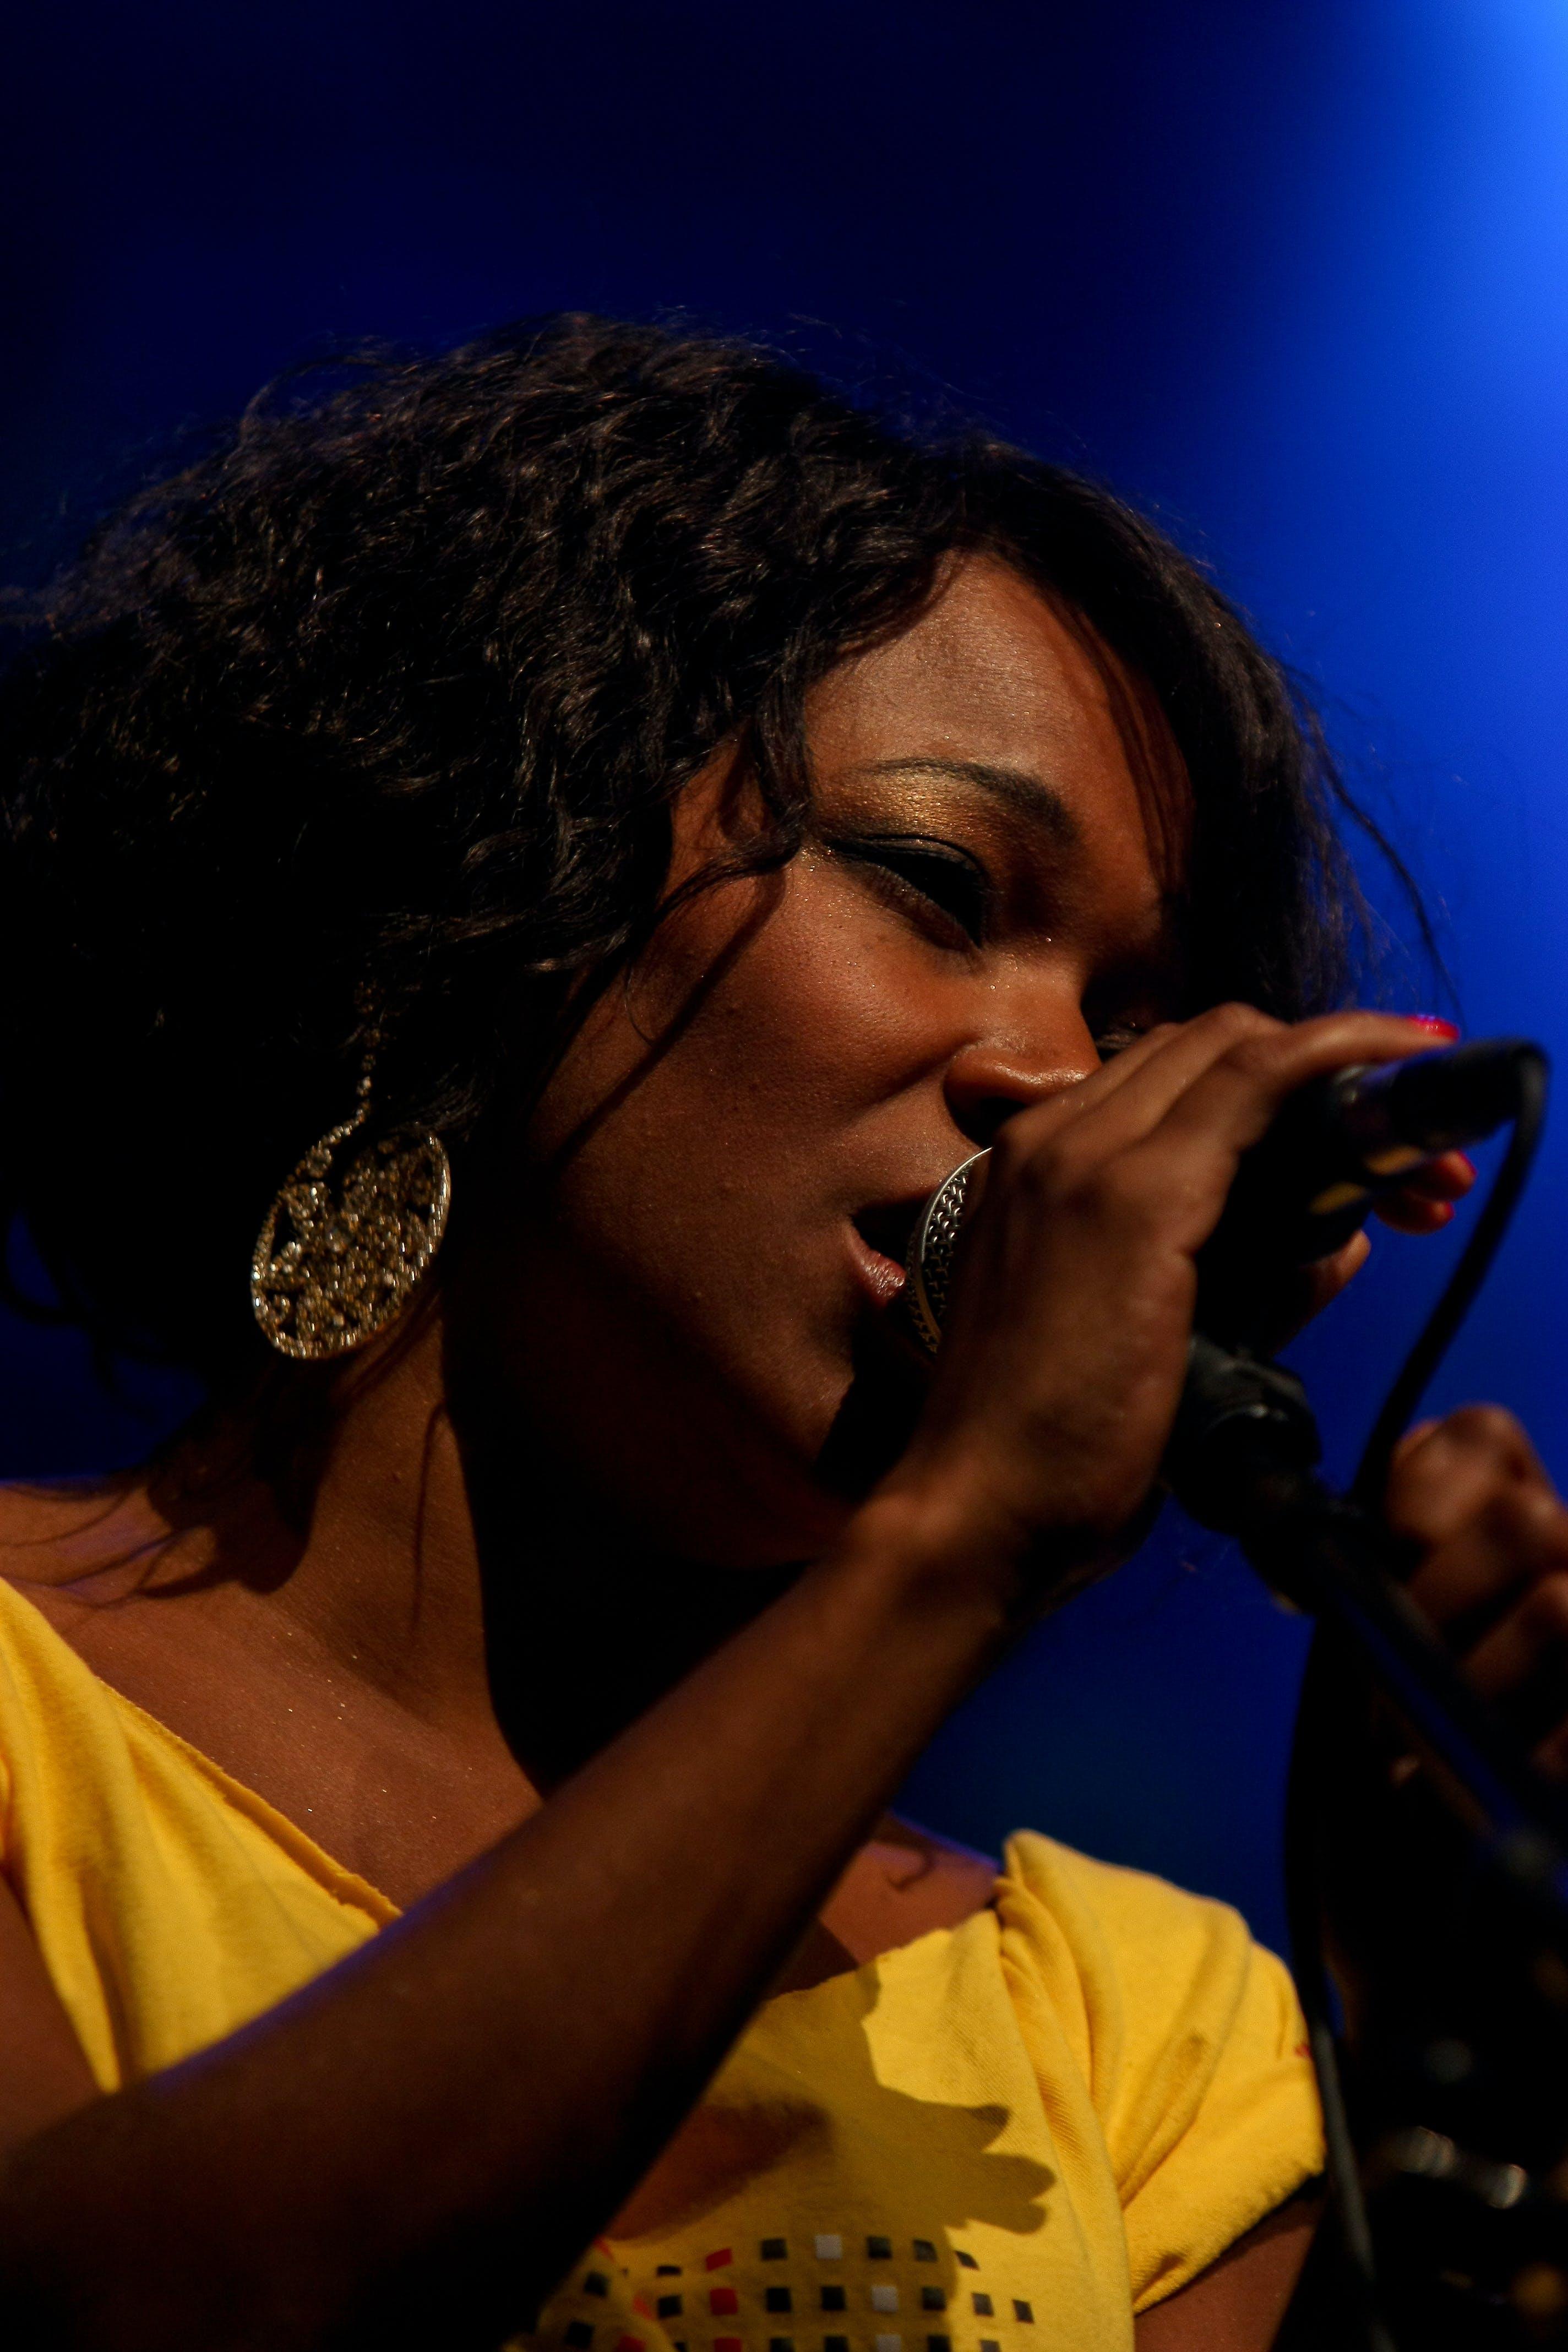 Close-Up Photo of Woman Singing